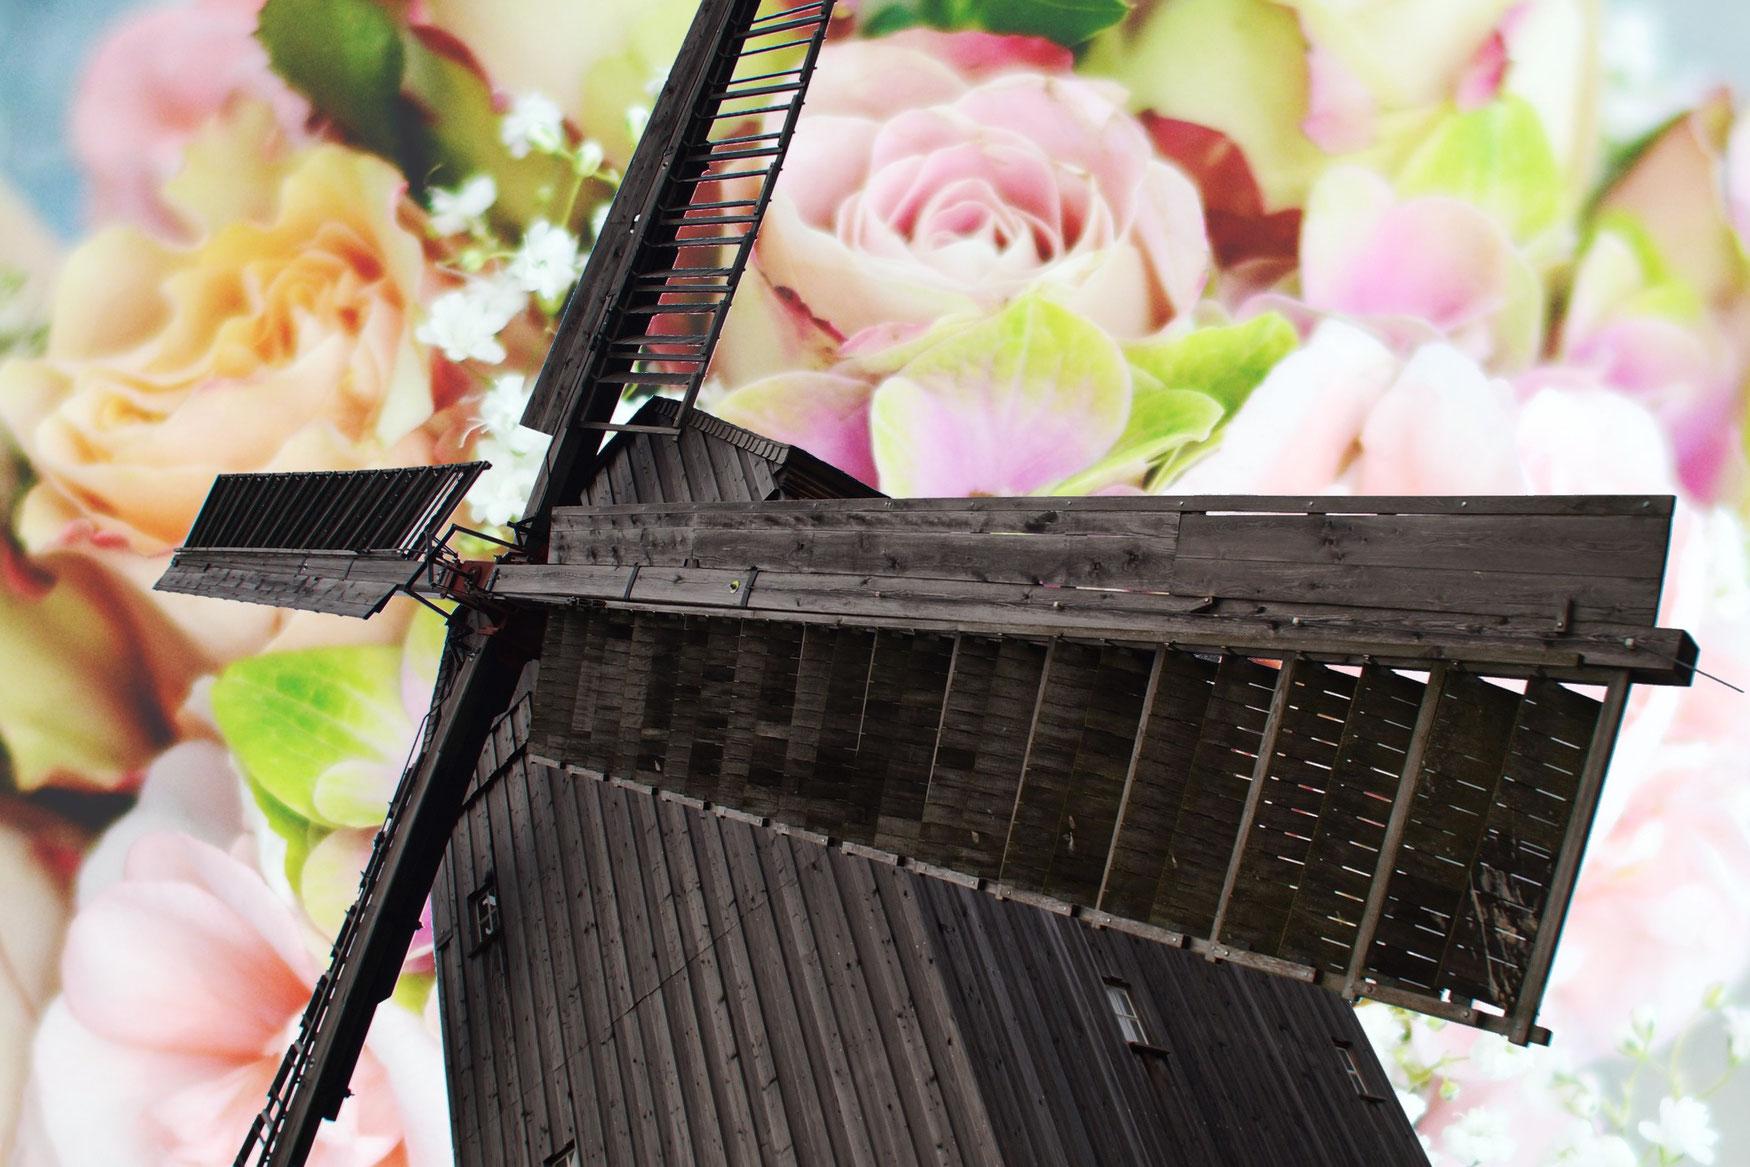 Beelitzer Bockwindmühle - Heiraten beim Bockwindmüller